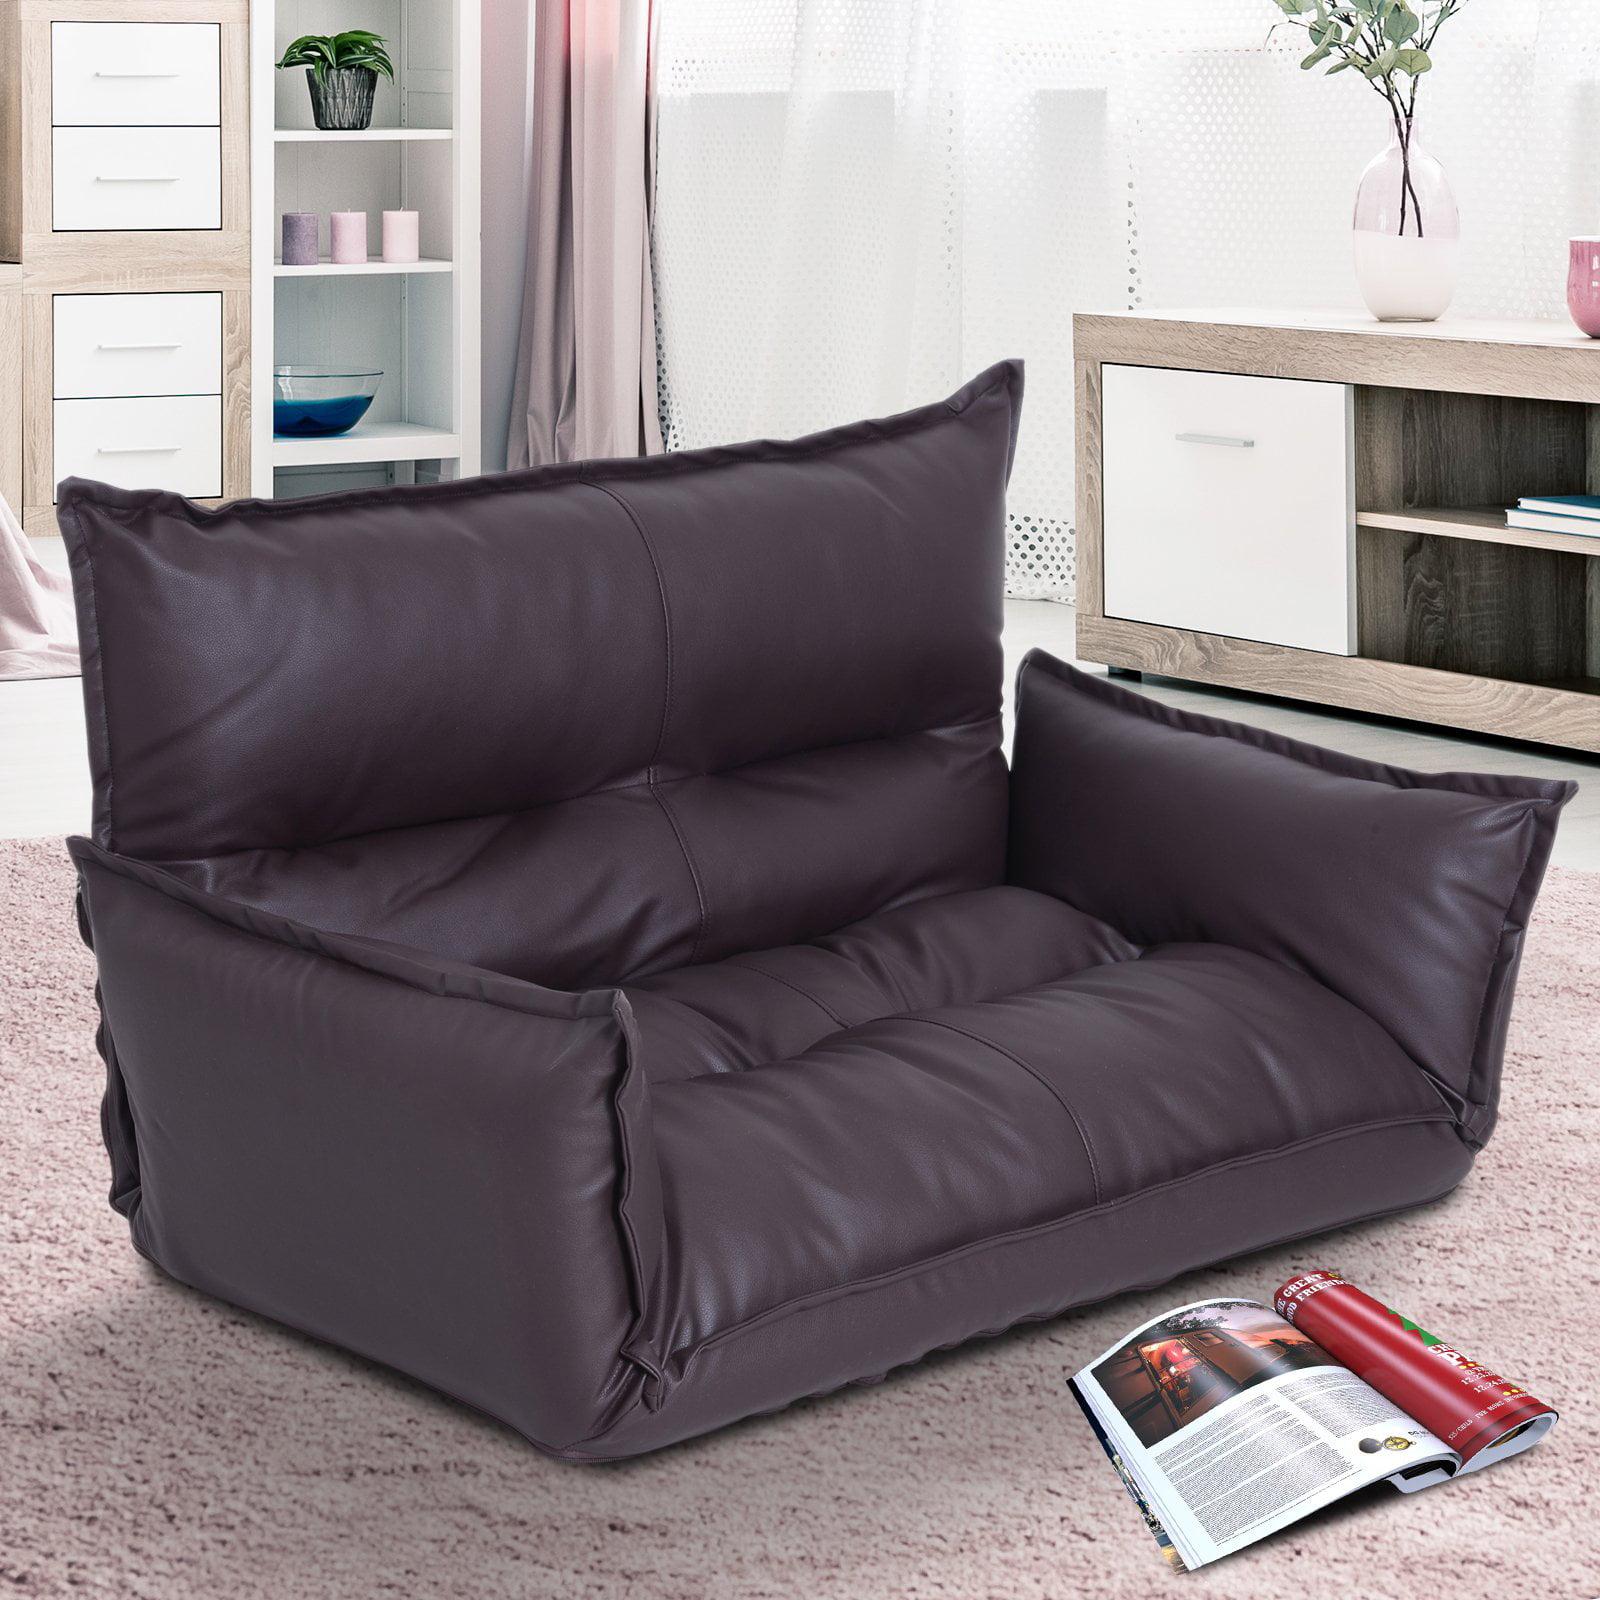 Floor Lazy Sofa Convertible Floor Game Video Chair Adjustable